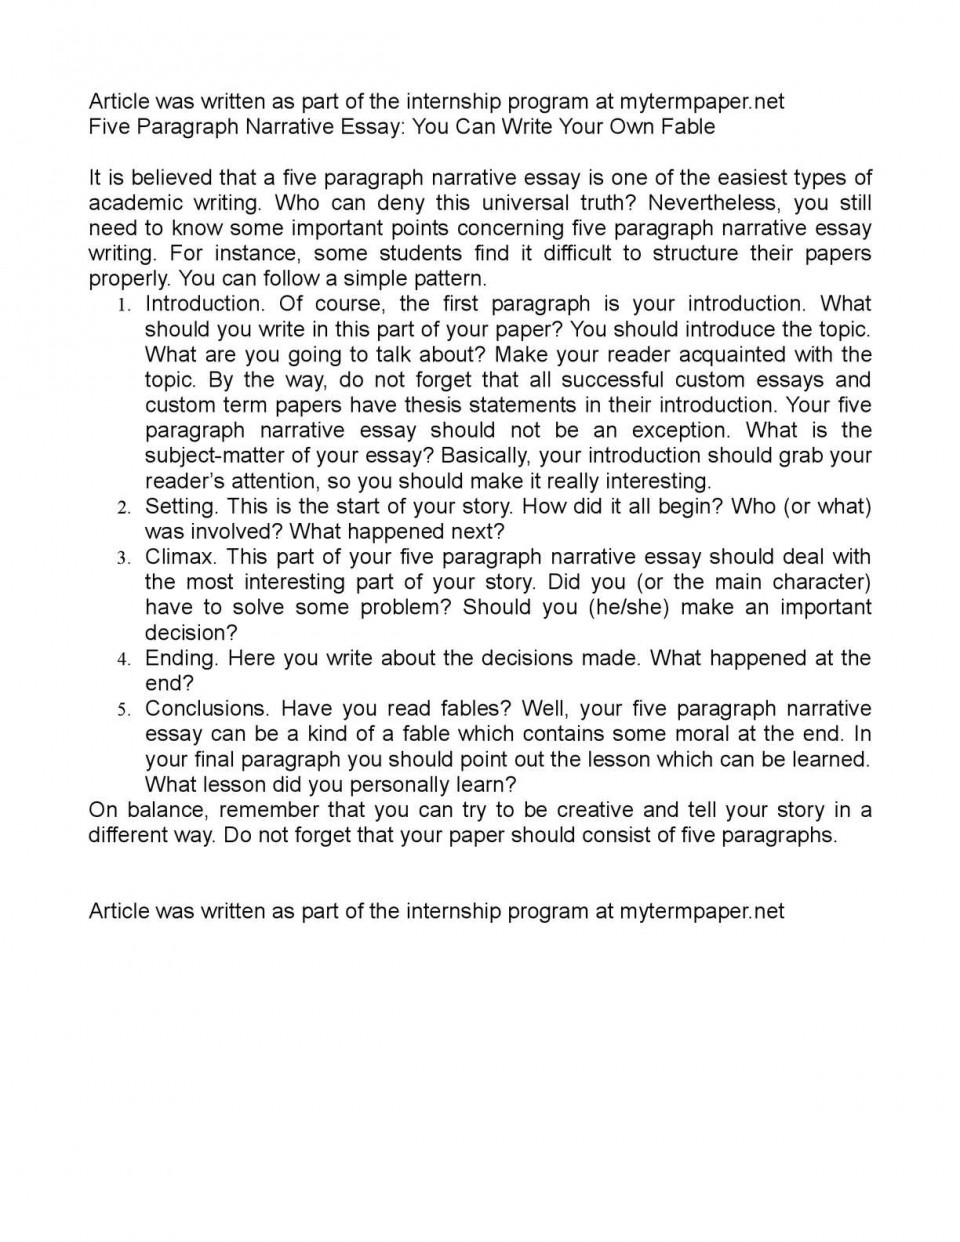 002 Paragraph Essay Example College Do Essays Have To Paragraphs Calam Eacute O Five Paragra Excellent 5 Pdf 960